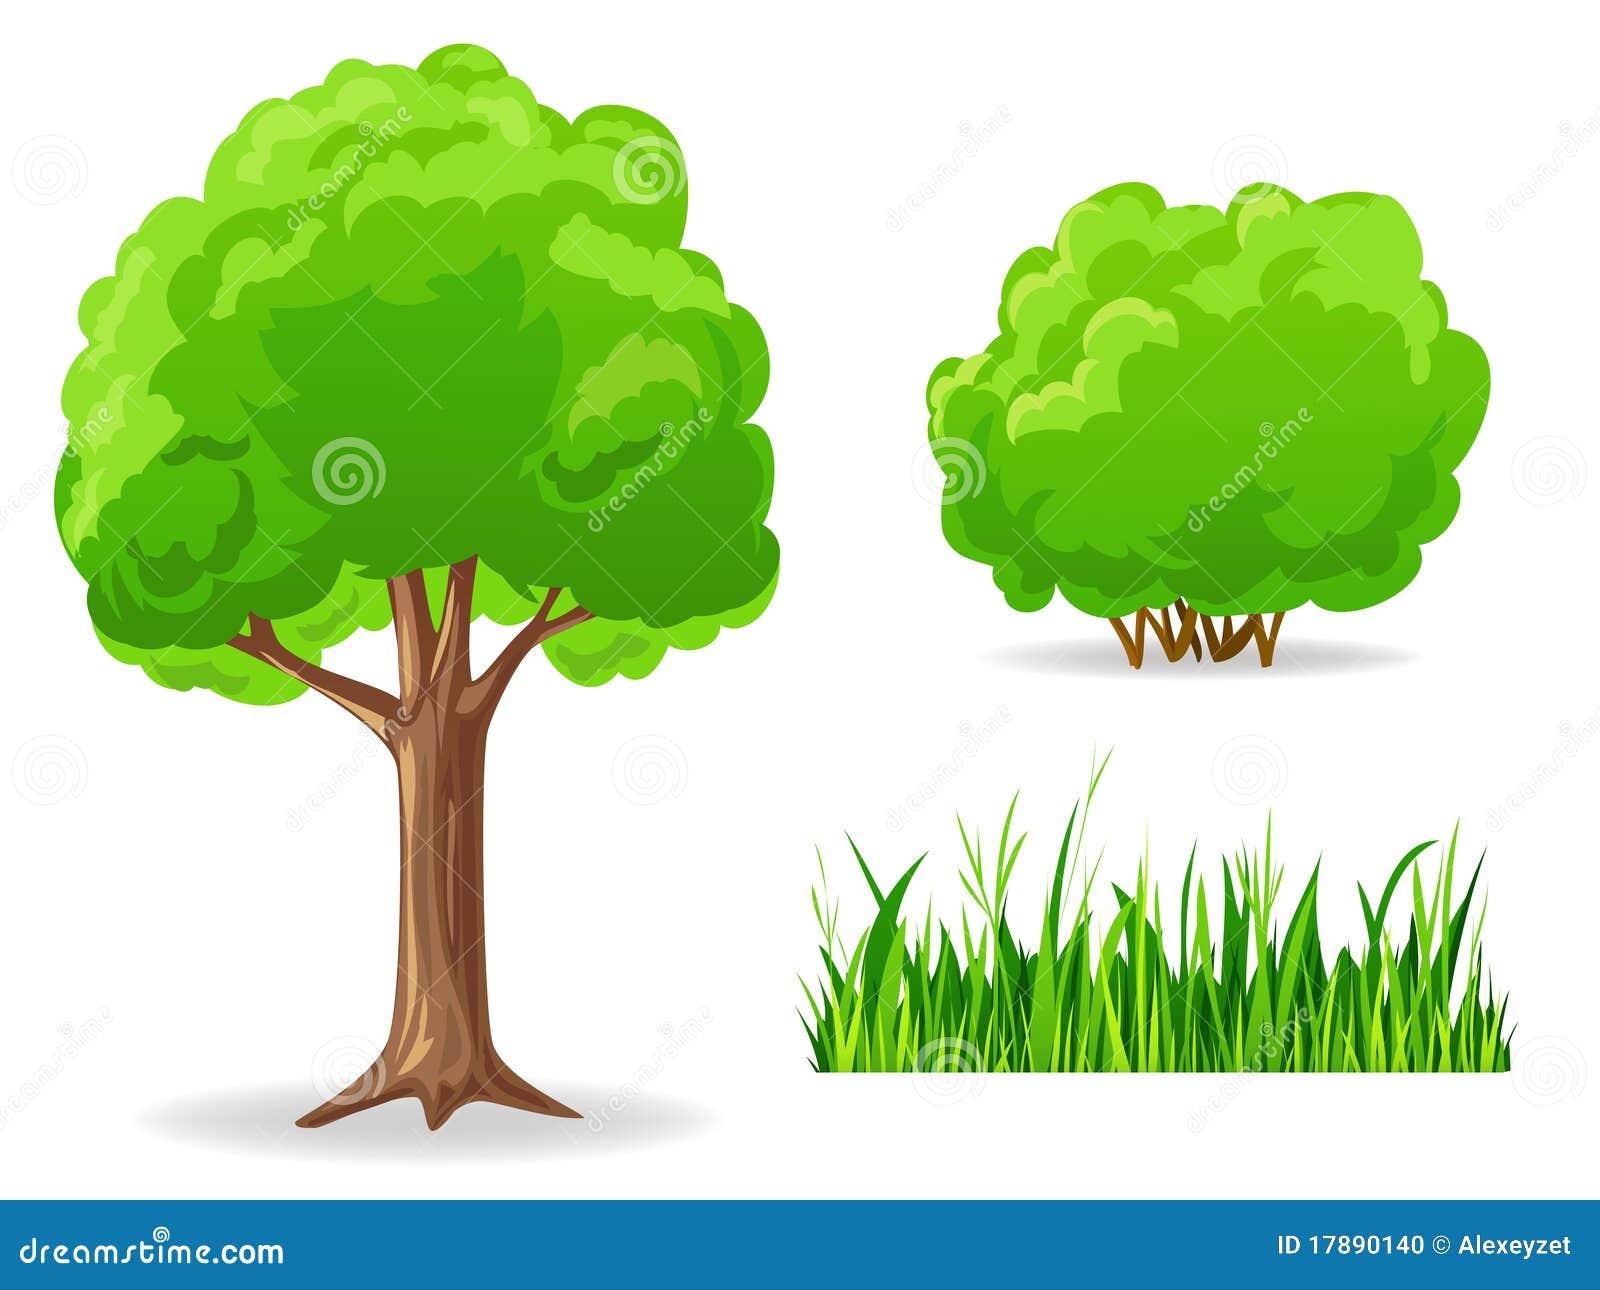 ensemble de plantes vertes de dessin anim arbre buisson herbe photo stock image 17890140. Black Bedroom Furniture Sets. Home Design Ideas